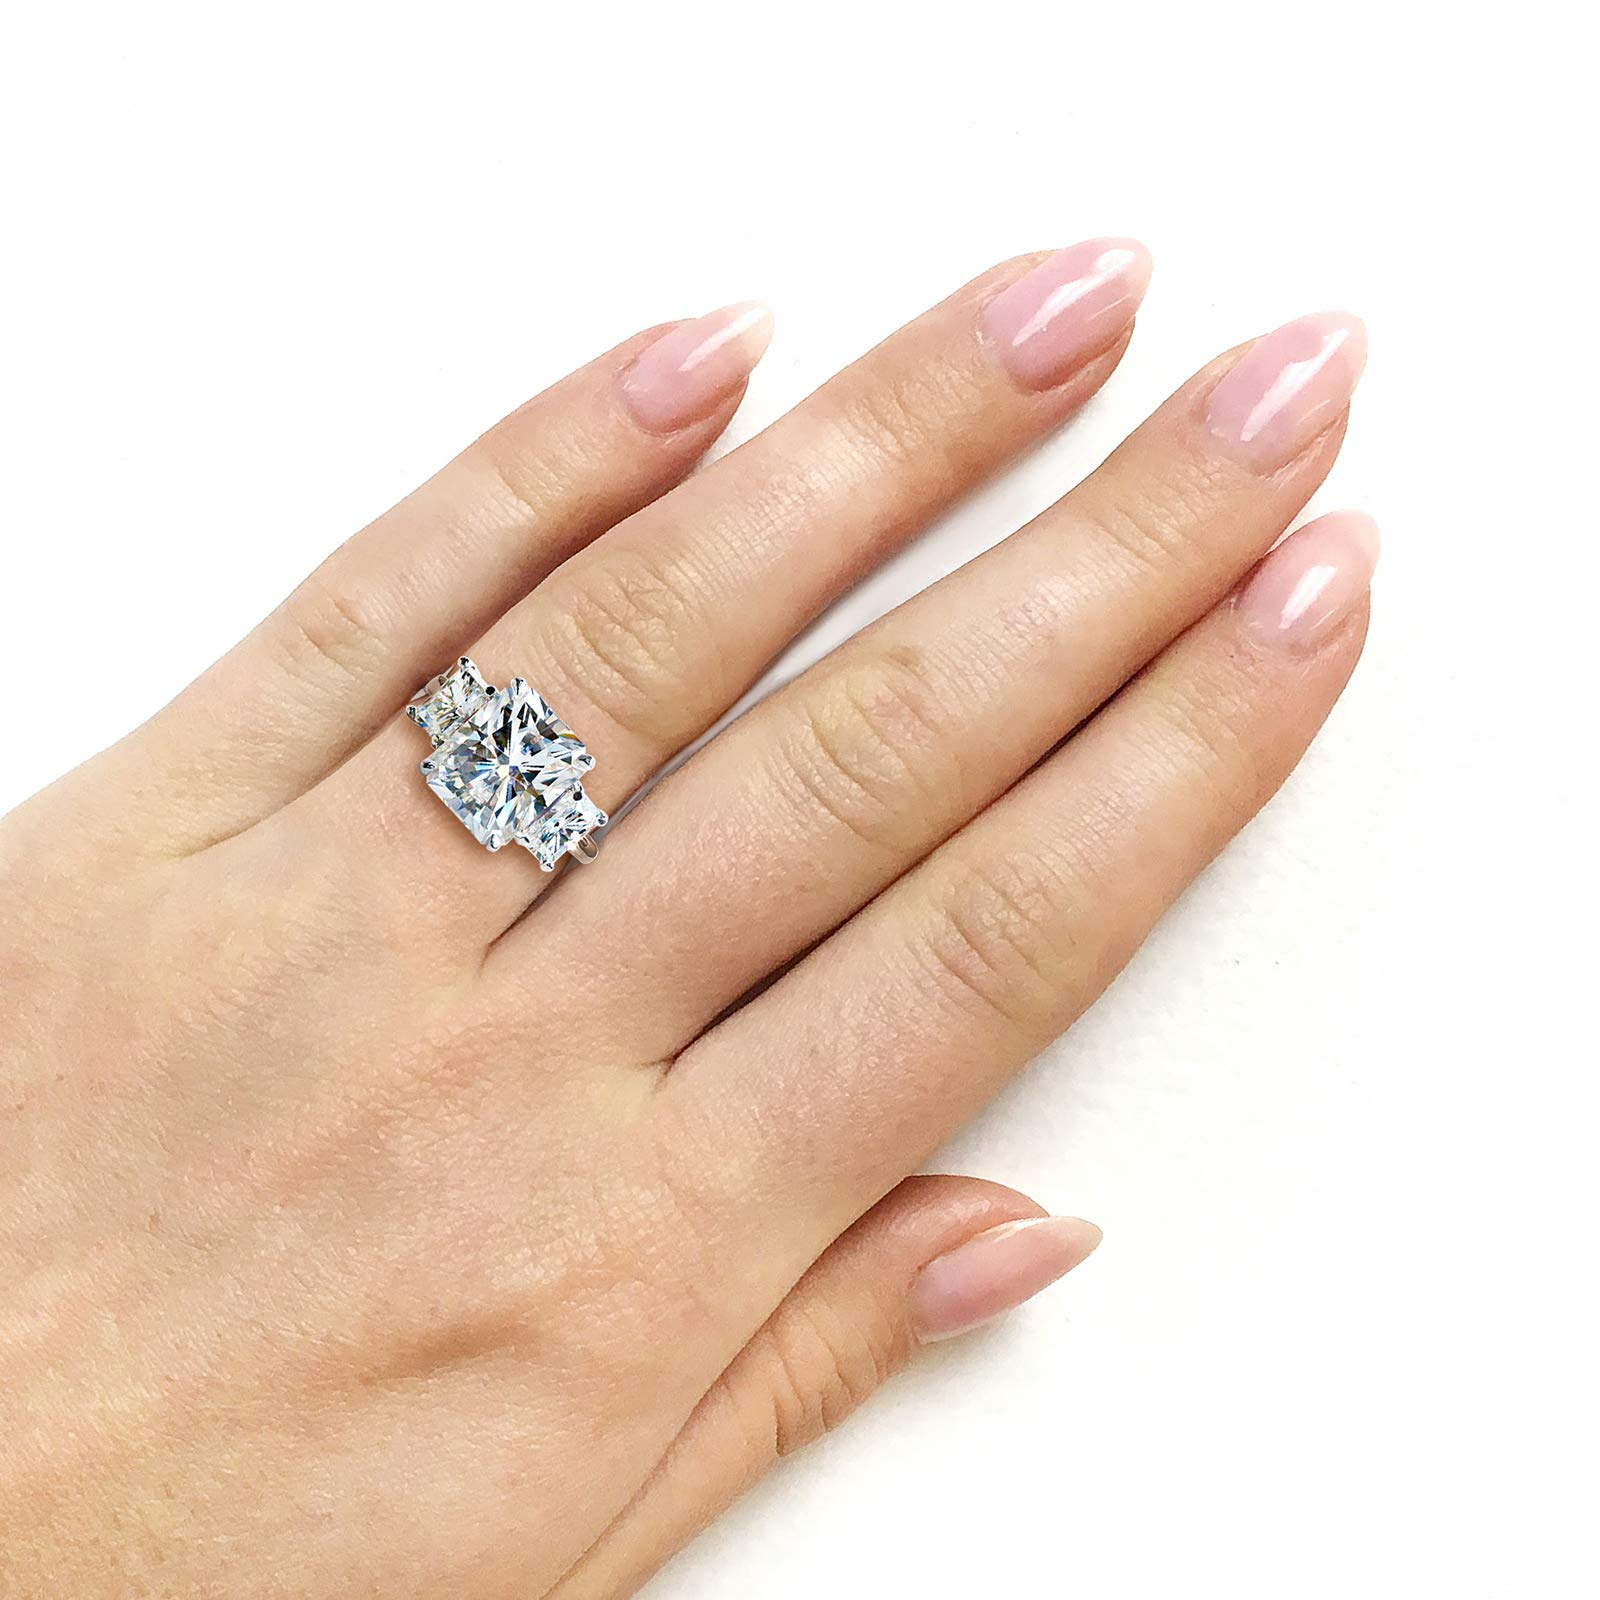 6 3/4 Carat TGW Three Stone Radiant Cut Moissanite Statement Engagement Ring in 14k White Gold, 7.5